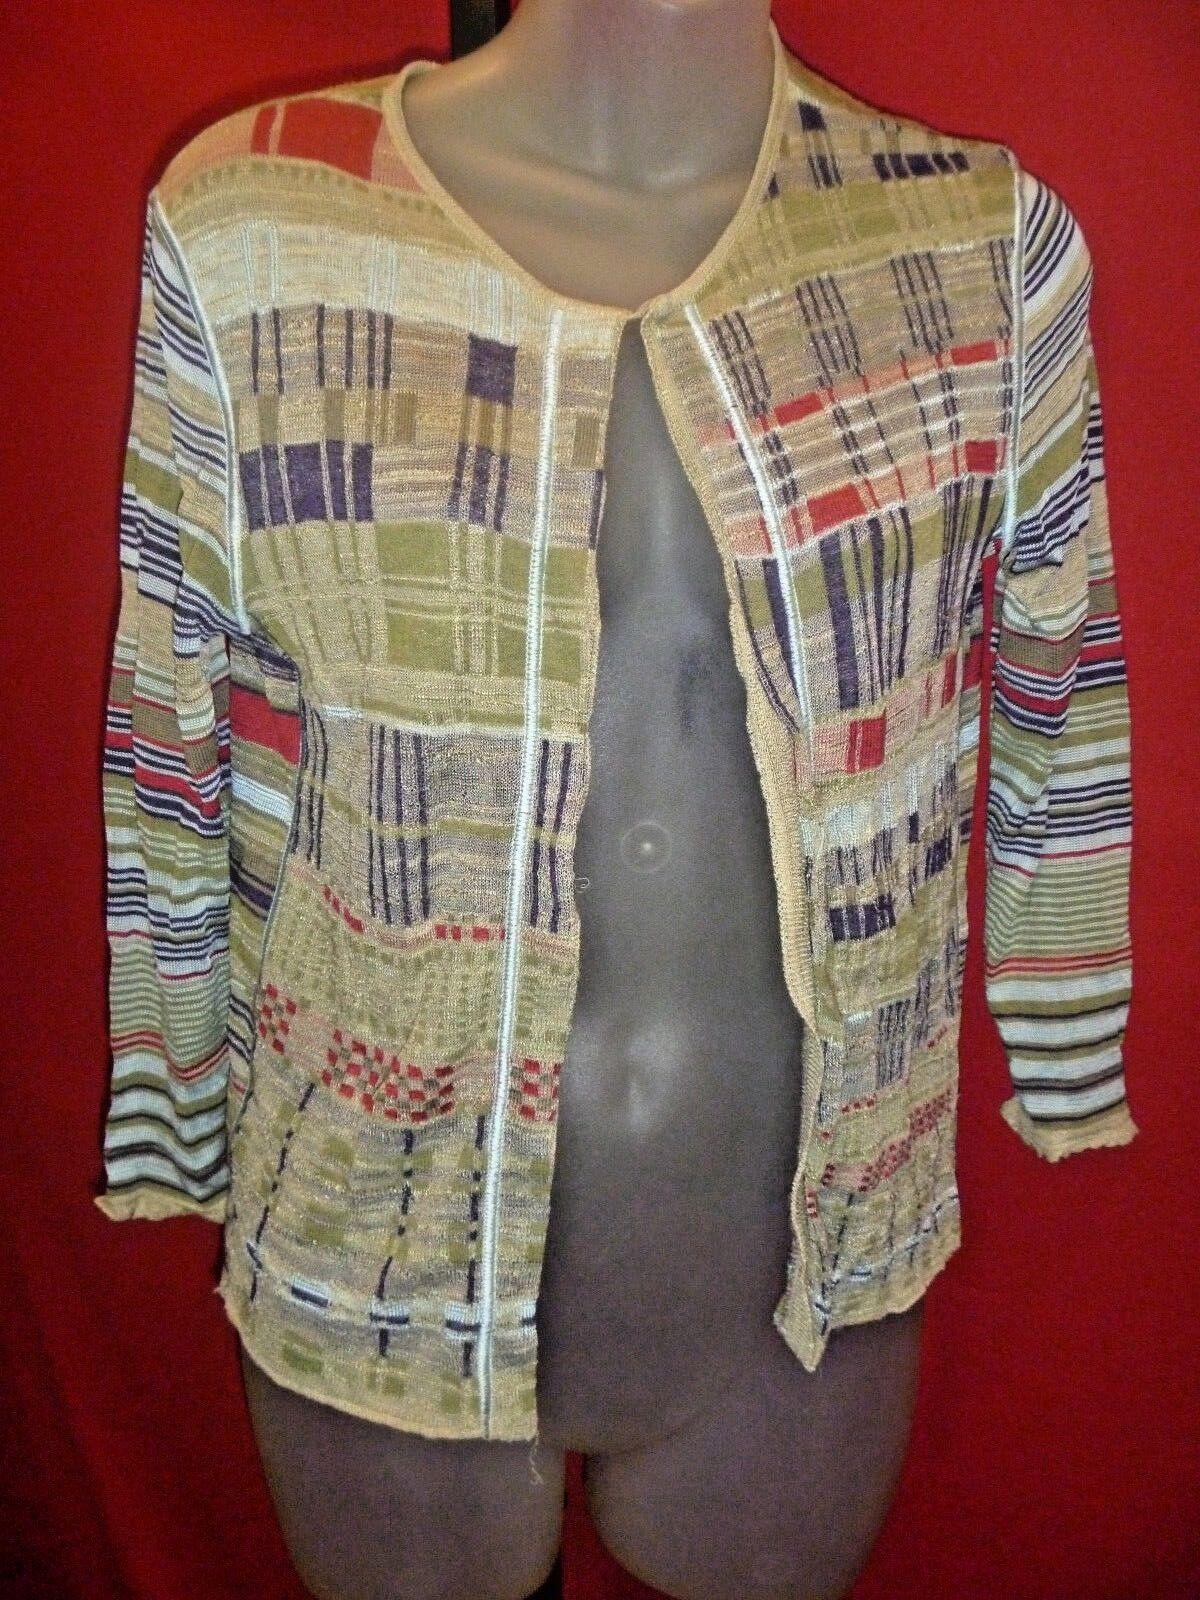 KENZO PARIS Authentic Women's striped Sweater Sz Small